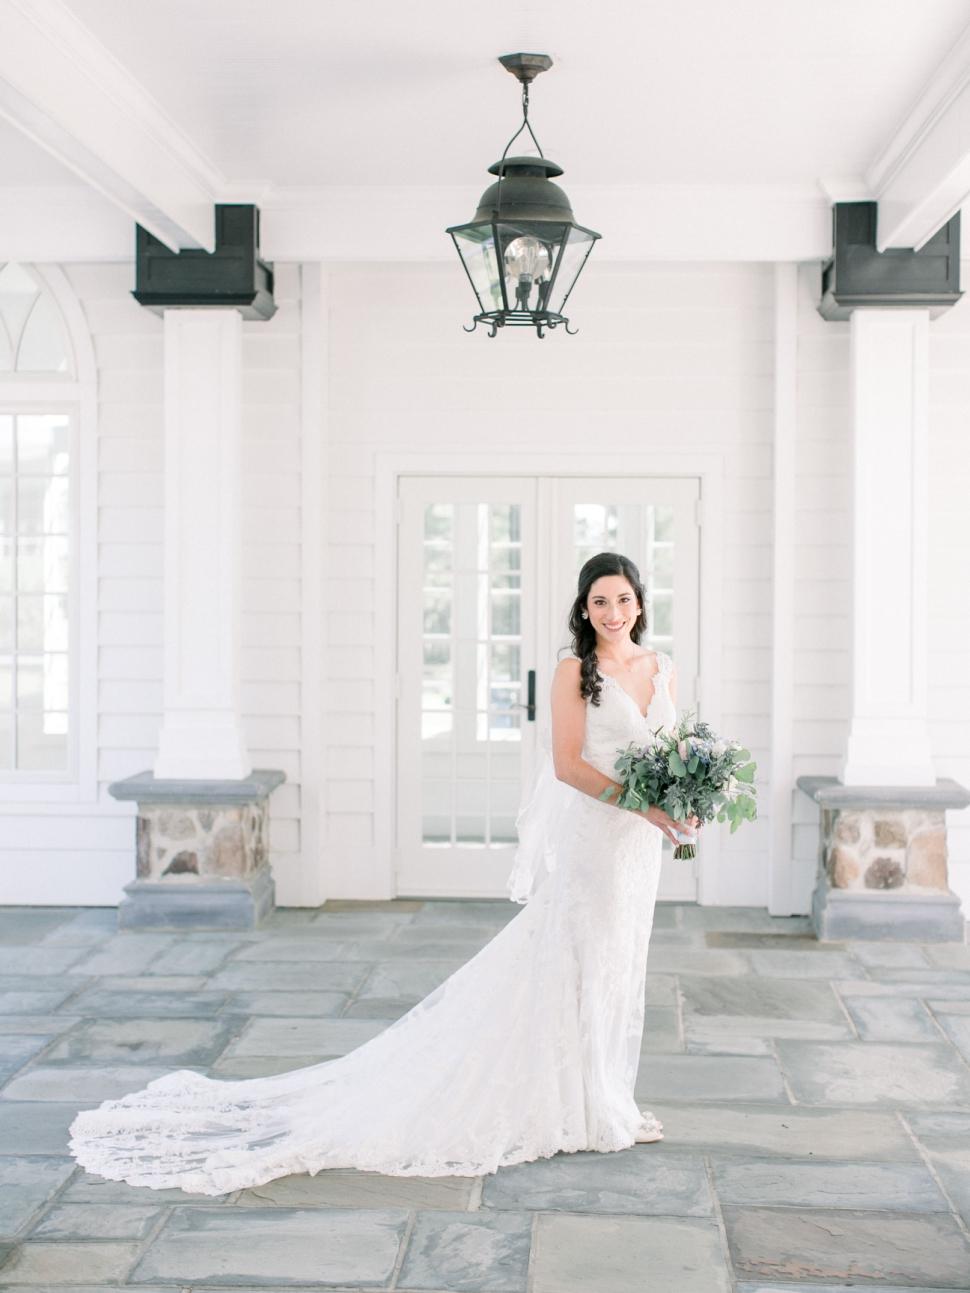 Ryland-Inn-Wedding-Photographer-Cassi-Claire_Ryland-Inn-Wedding_14.jpg